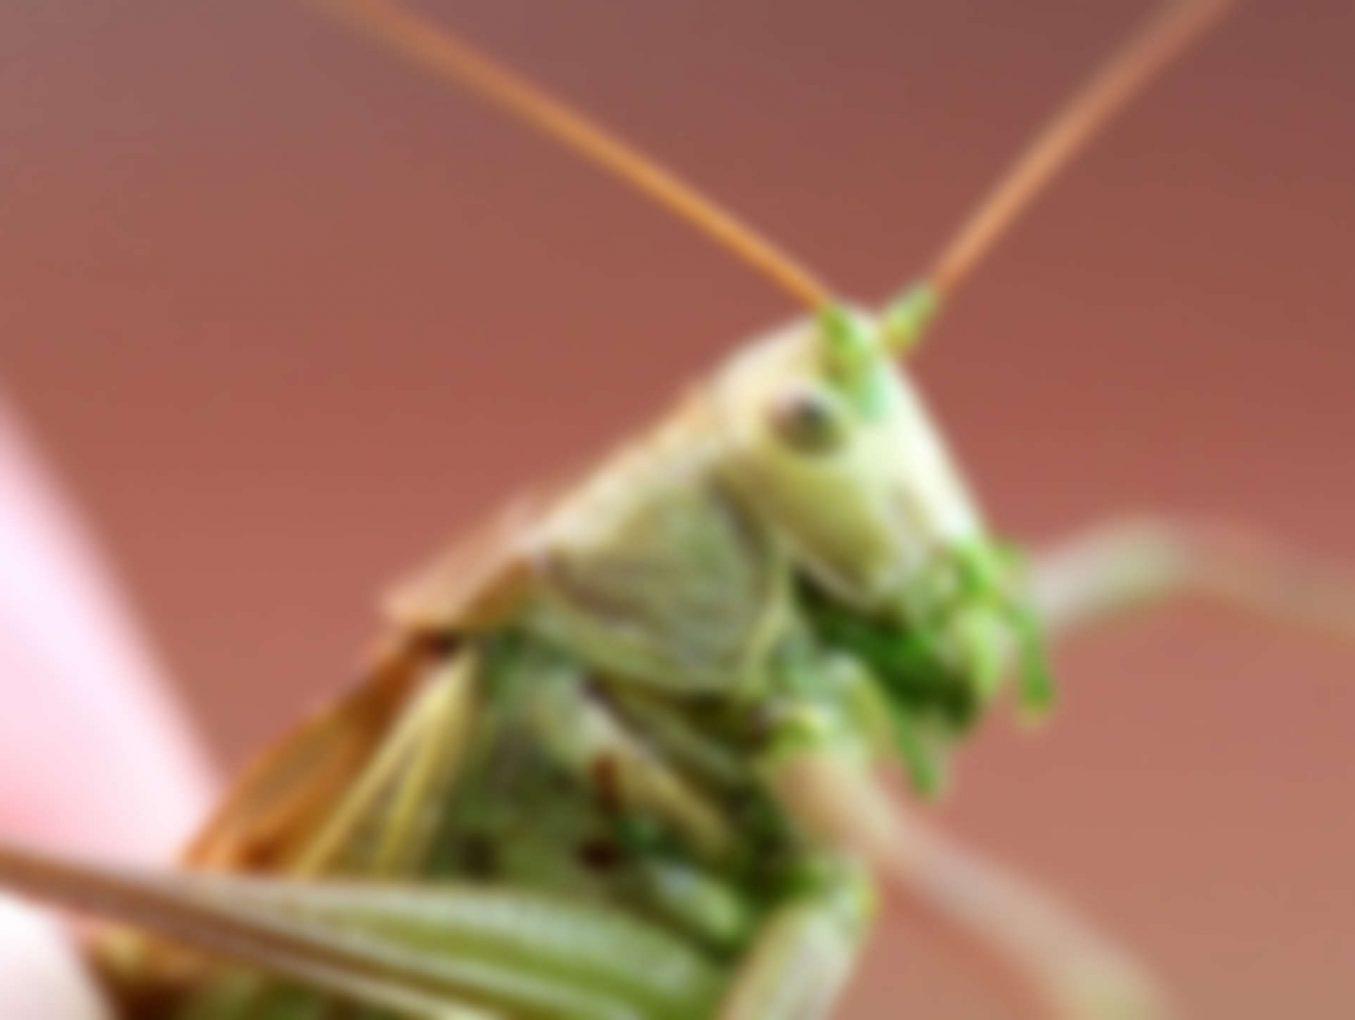 Flies: Getting Rid of Them